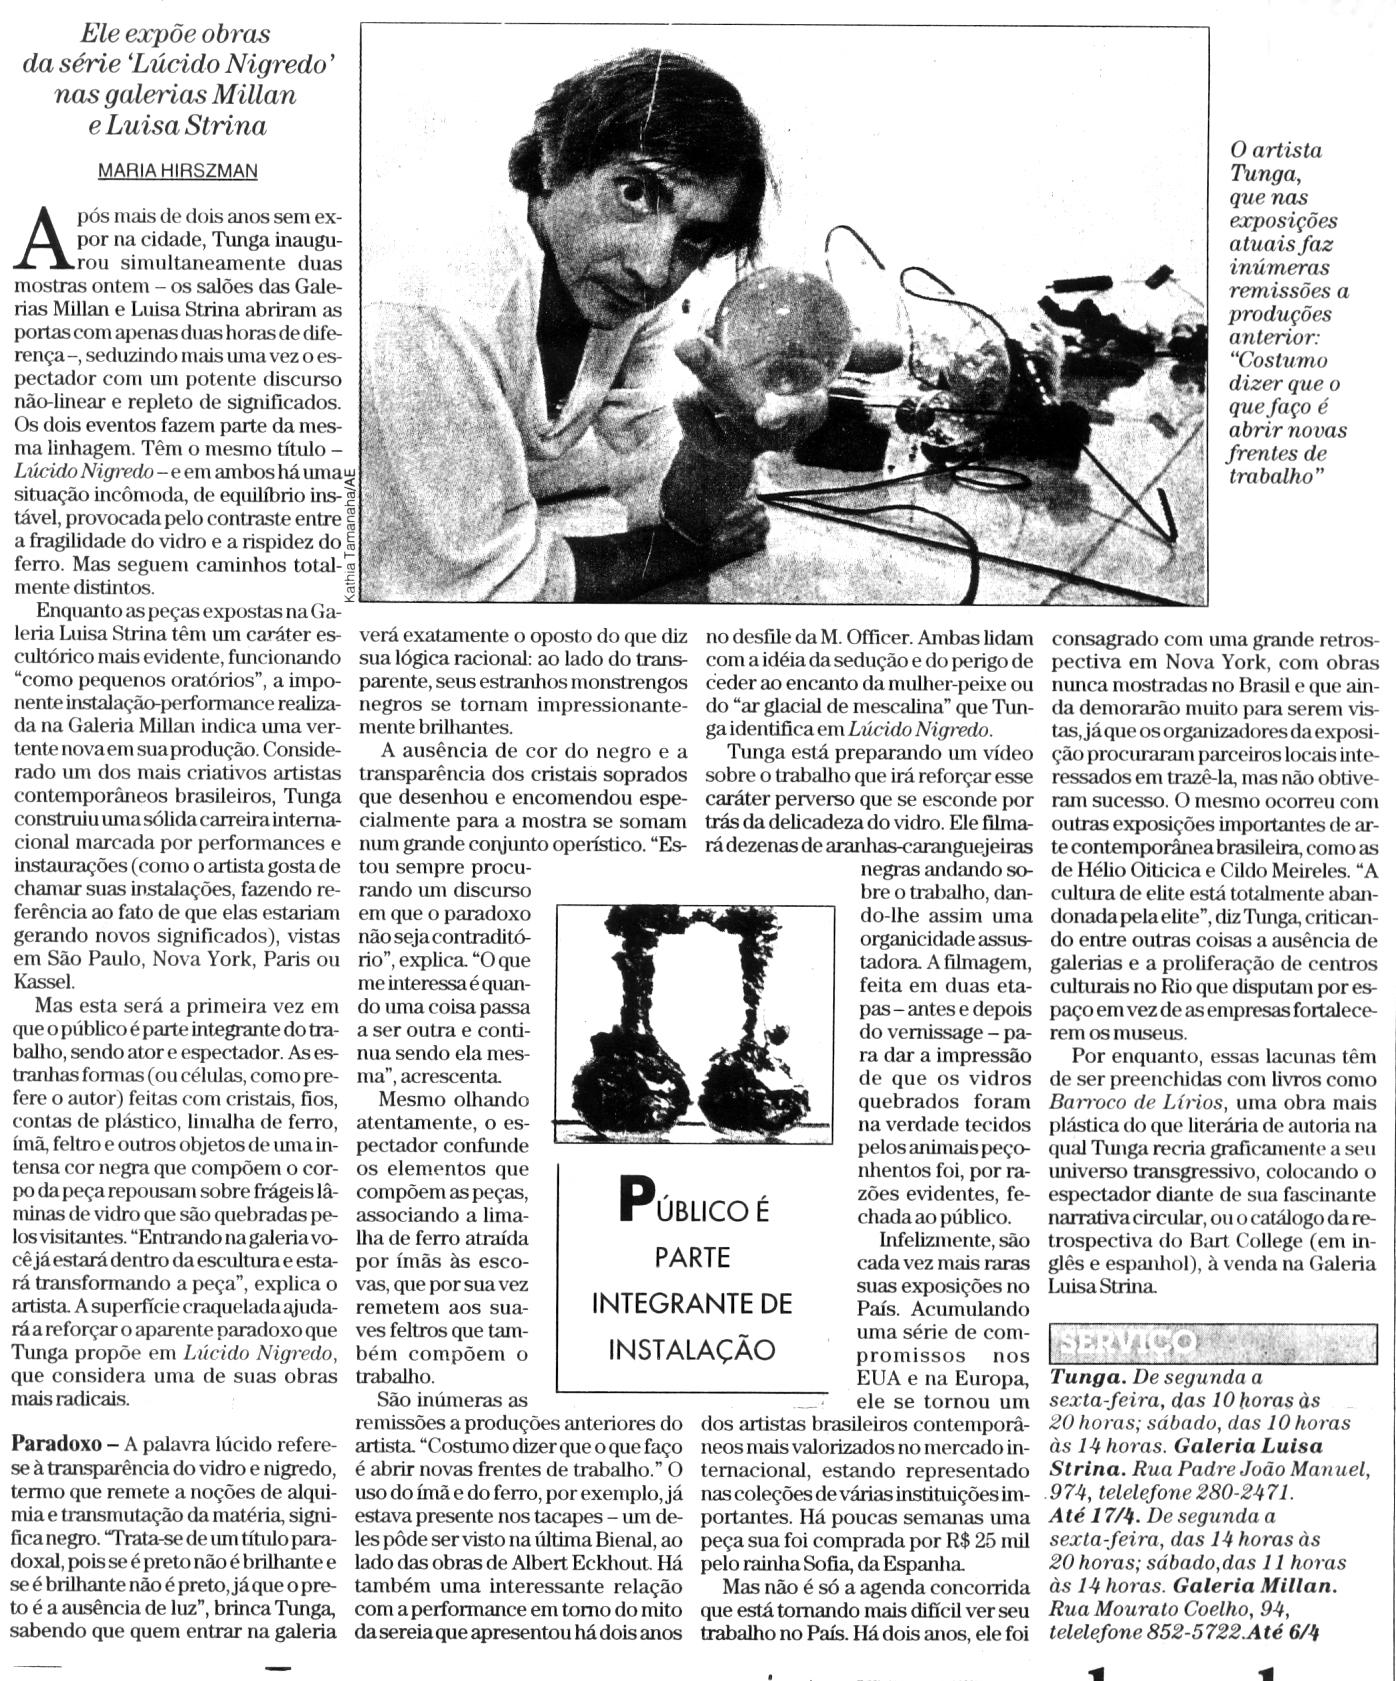 """Lúcido Nigredo"" – Galeria Luisa Strina"